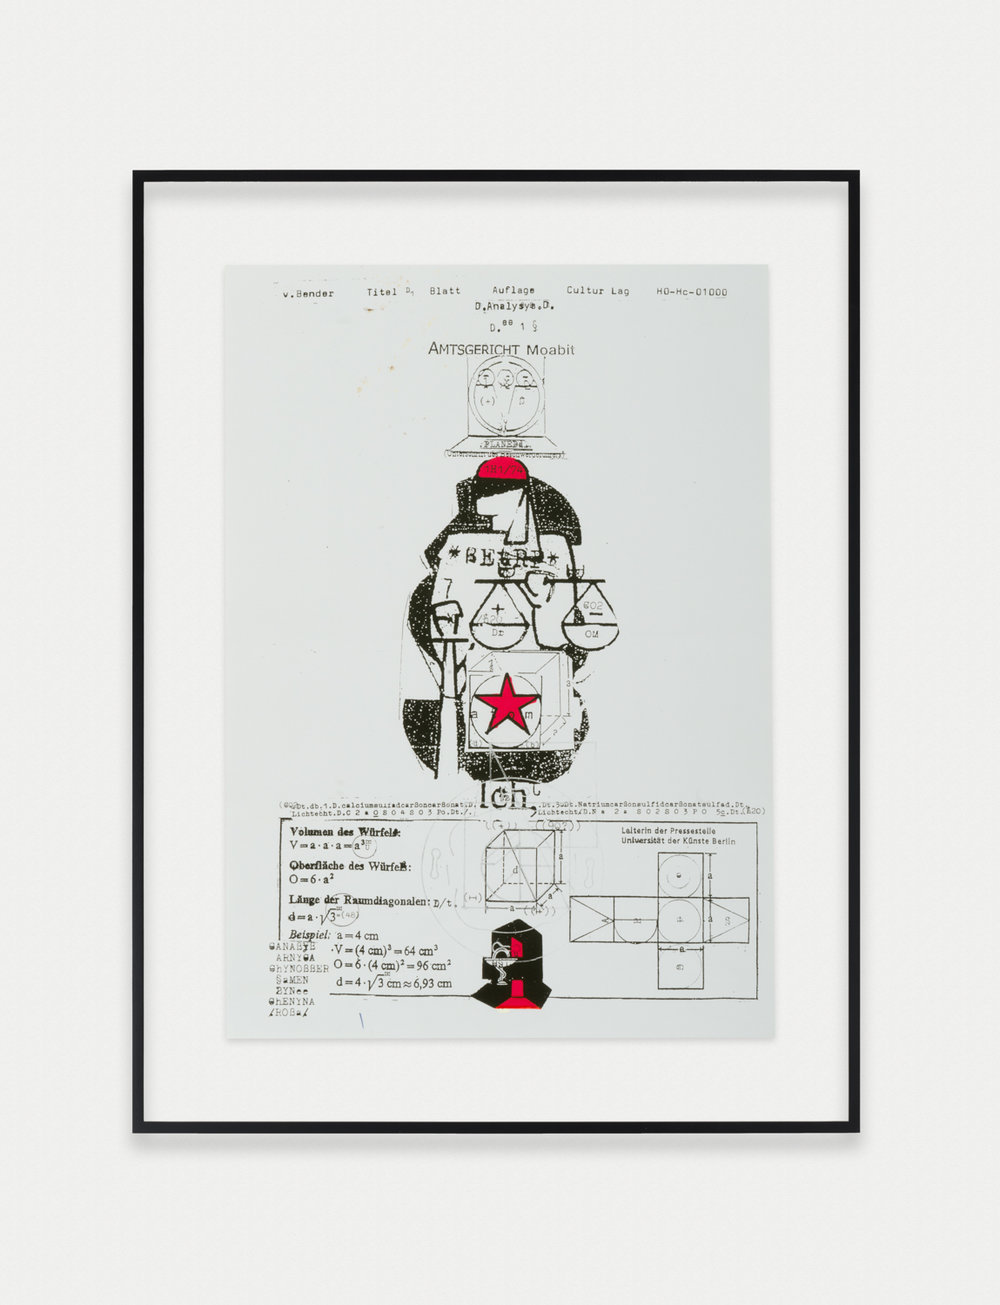 Adelhyd van Bender Untitled 1999-2014 Mixed media on photocopy 16.5 x 11.75 in (41.91h x 29.85w cm) AVB015